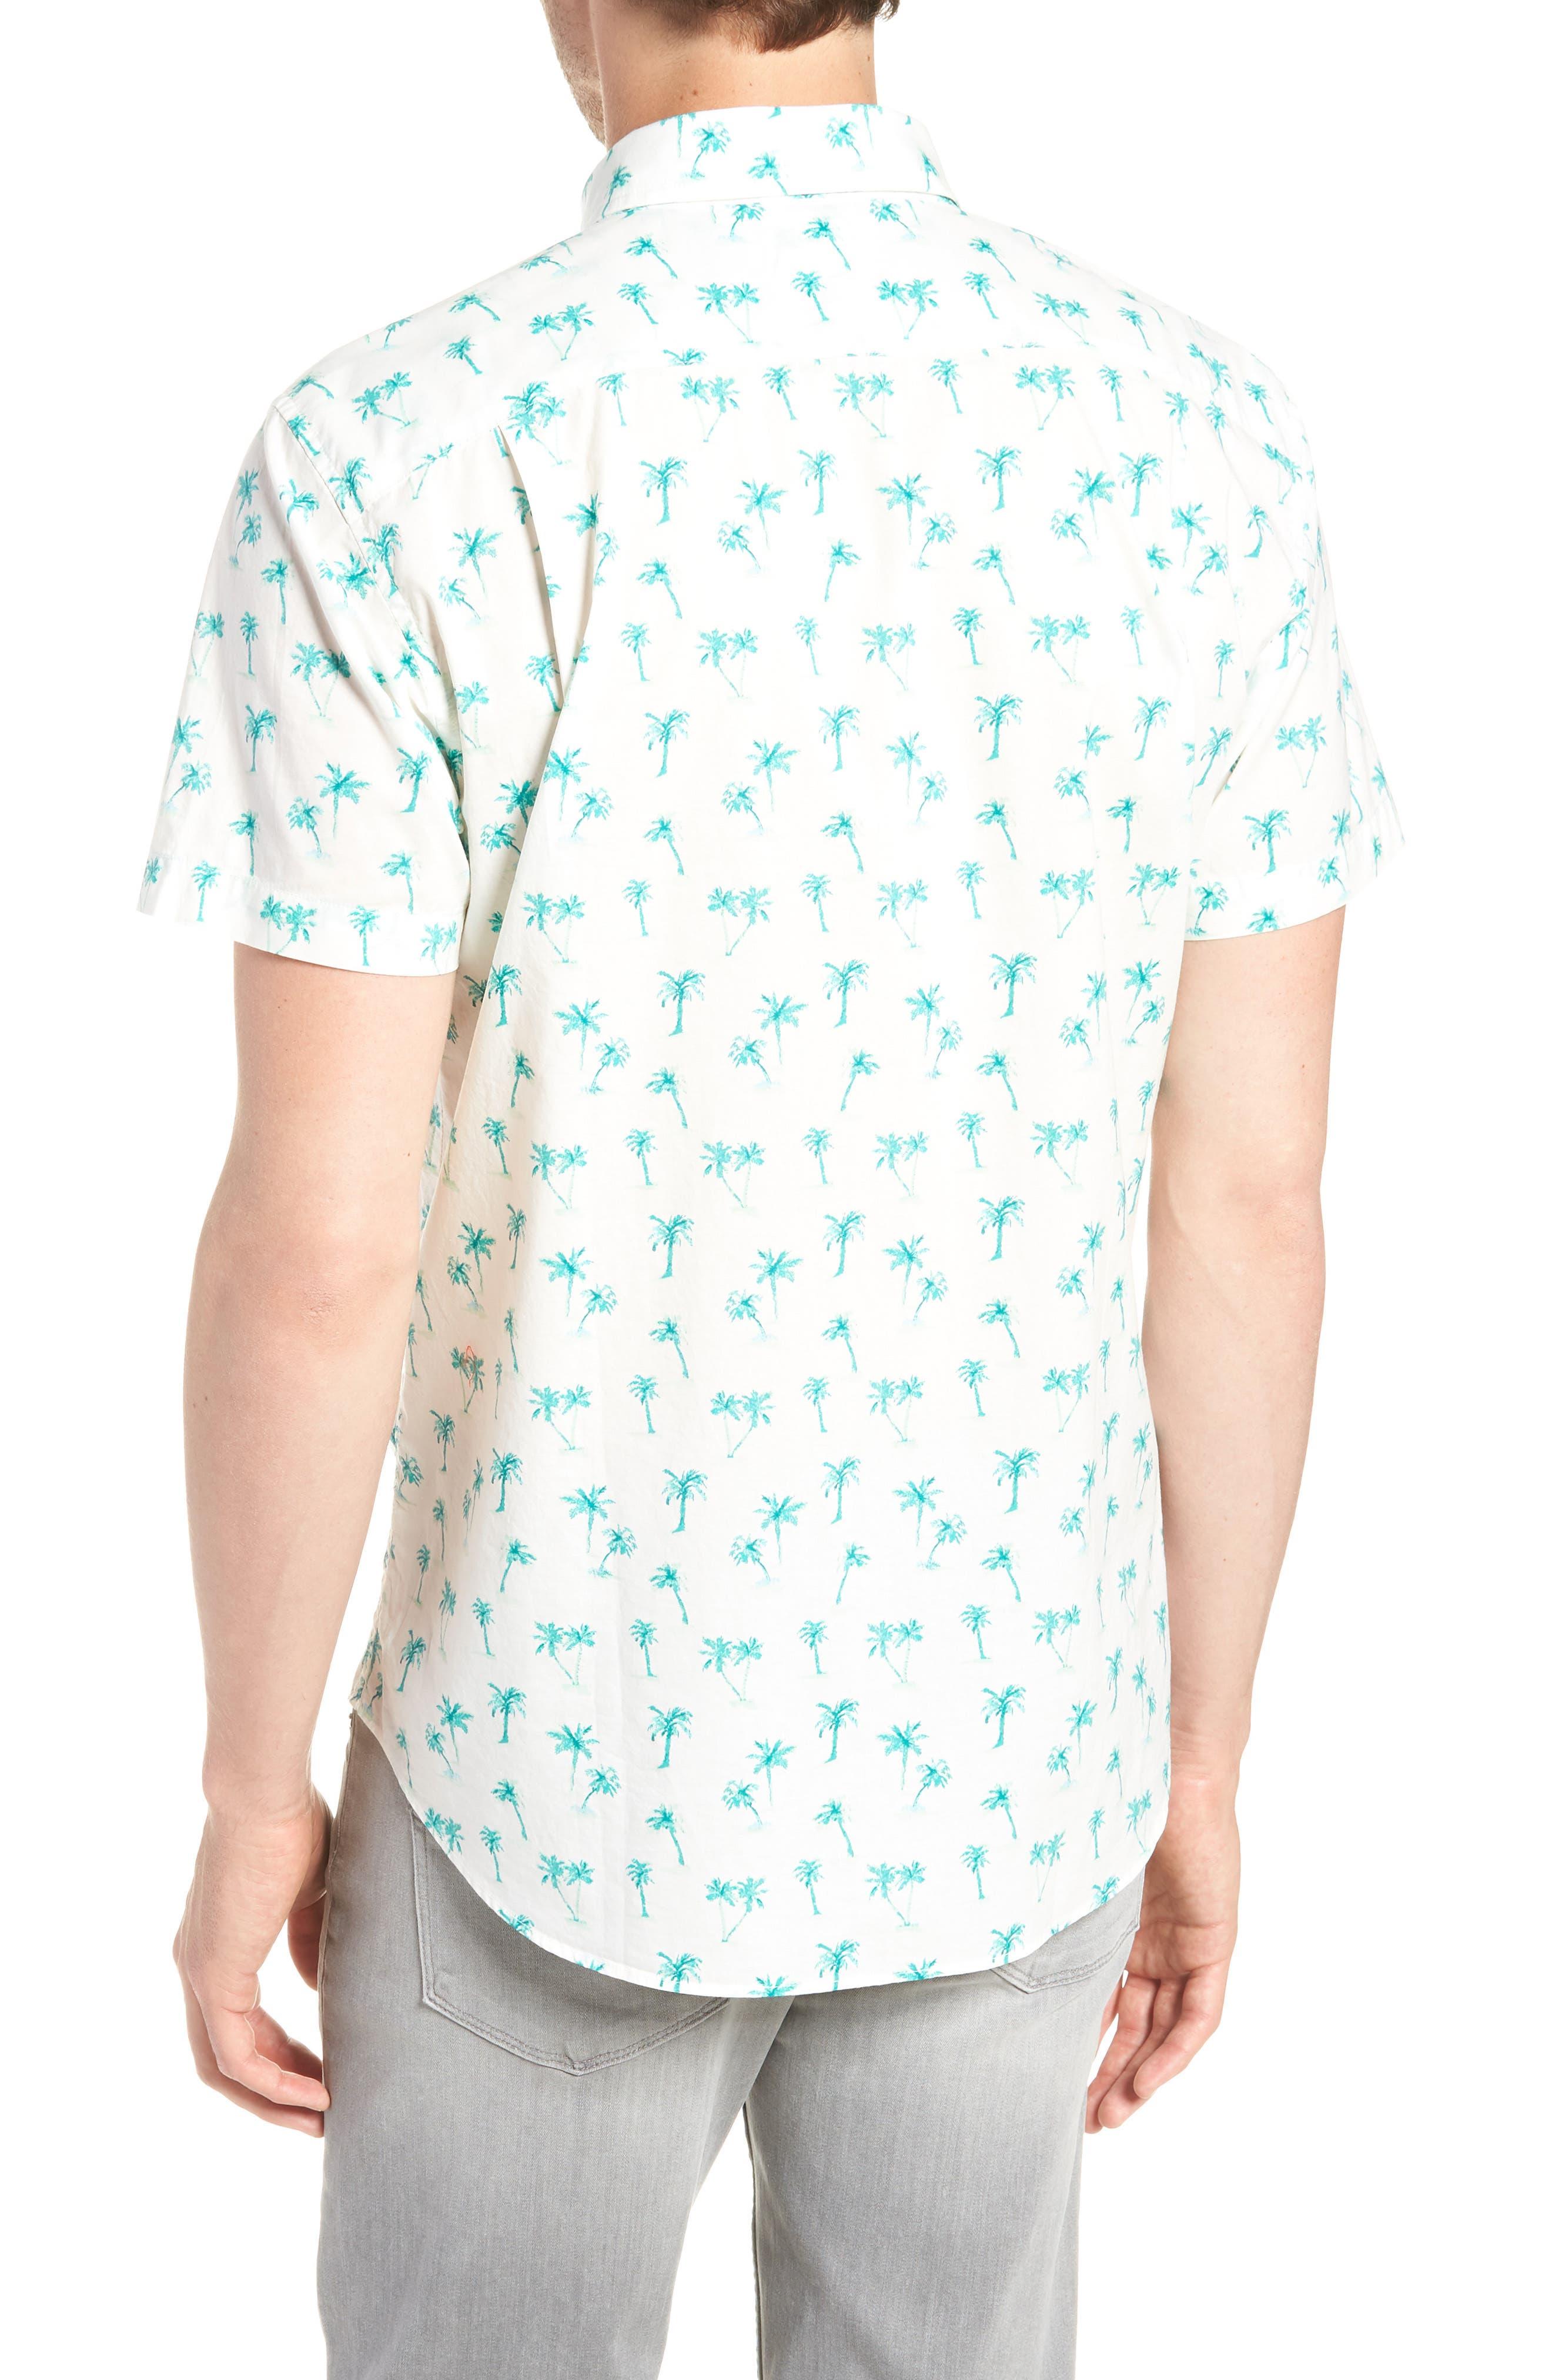 Riviera Slim Fit Palm Print Sport Shirt,                             Alternate thumbnail 3, color,                             Dreamy Palm - Latigo Bay